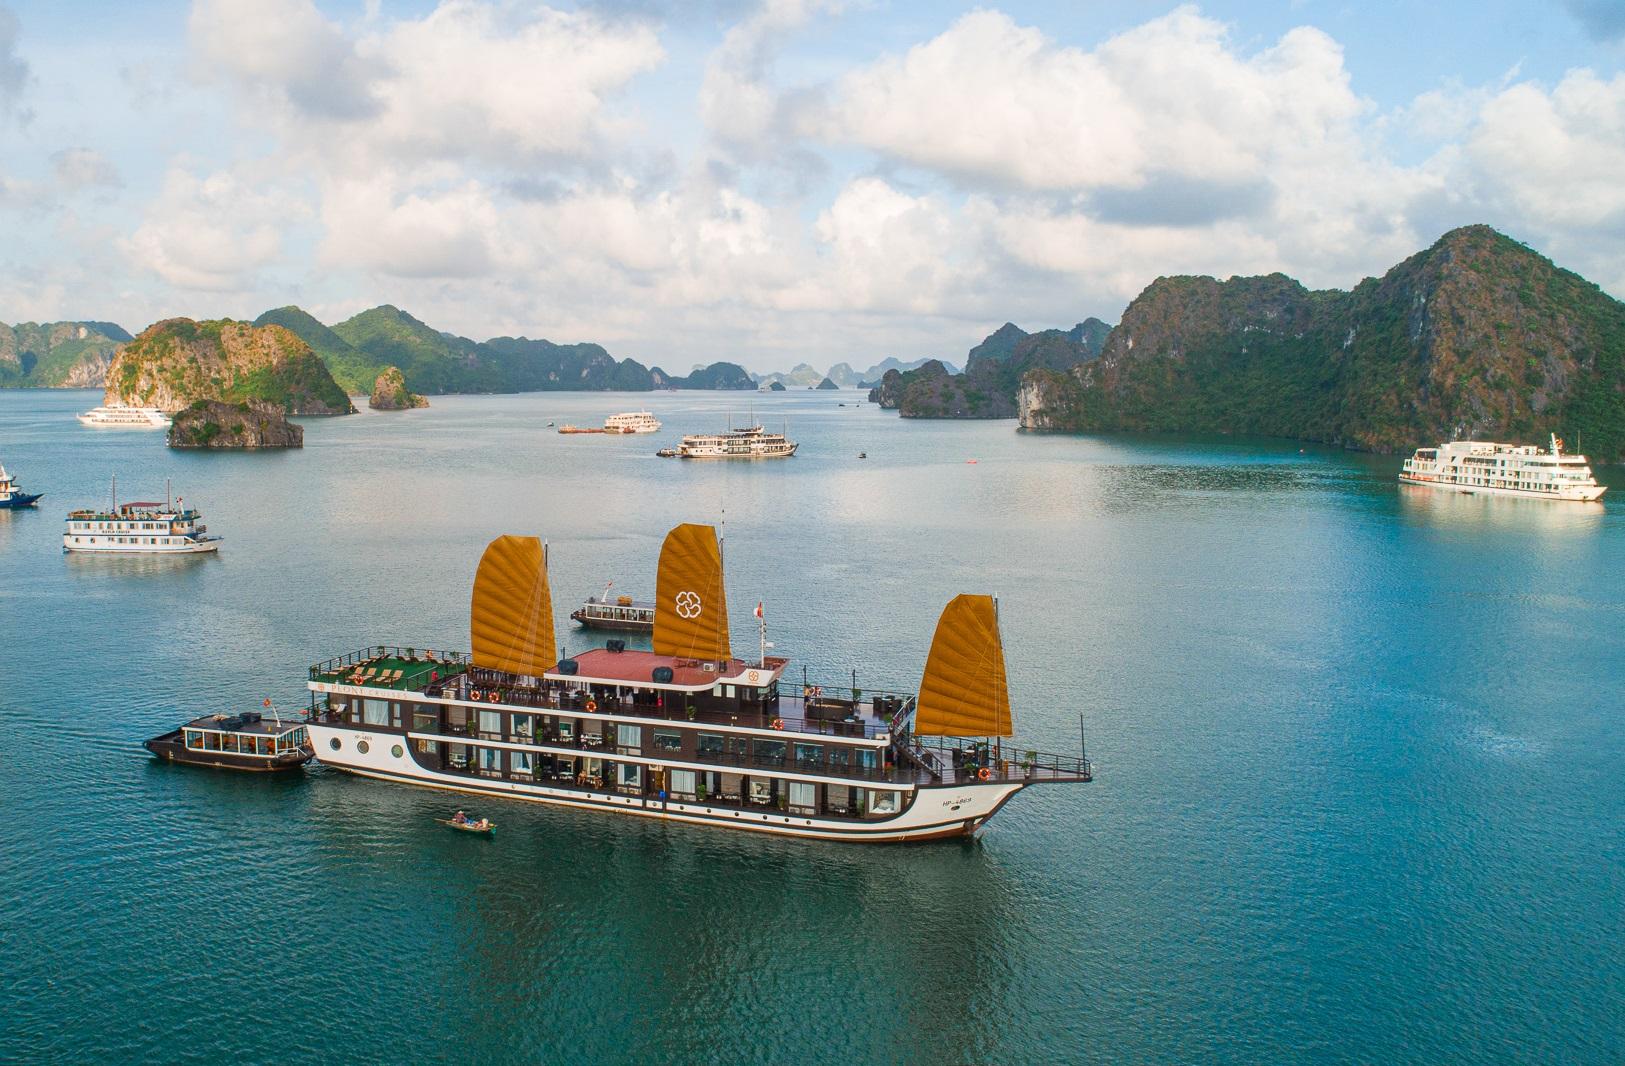 Peony Cruise - Best seller 4* cruise